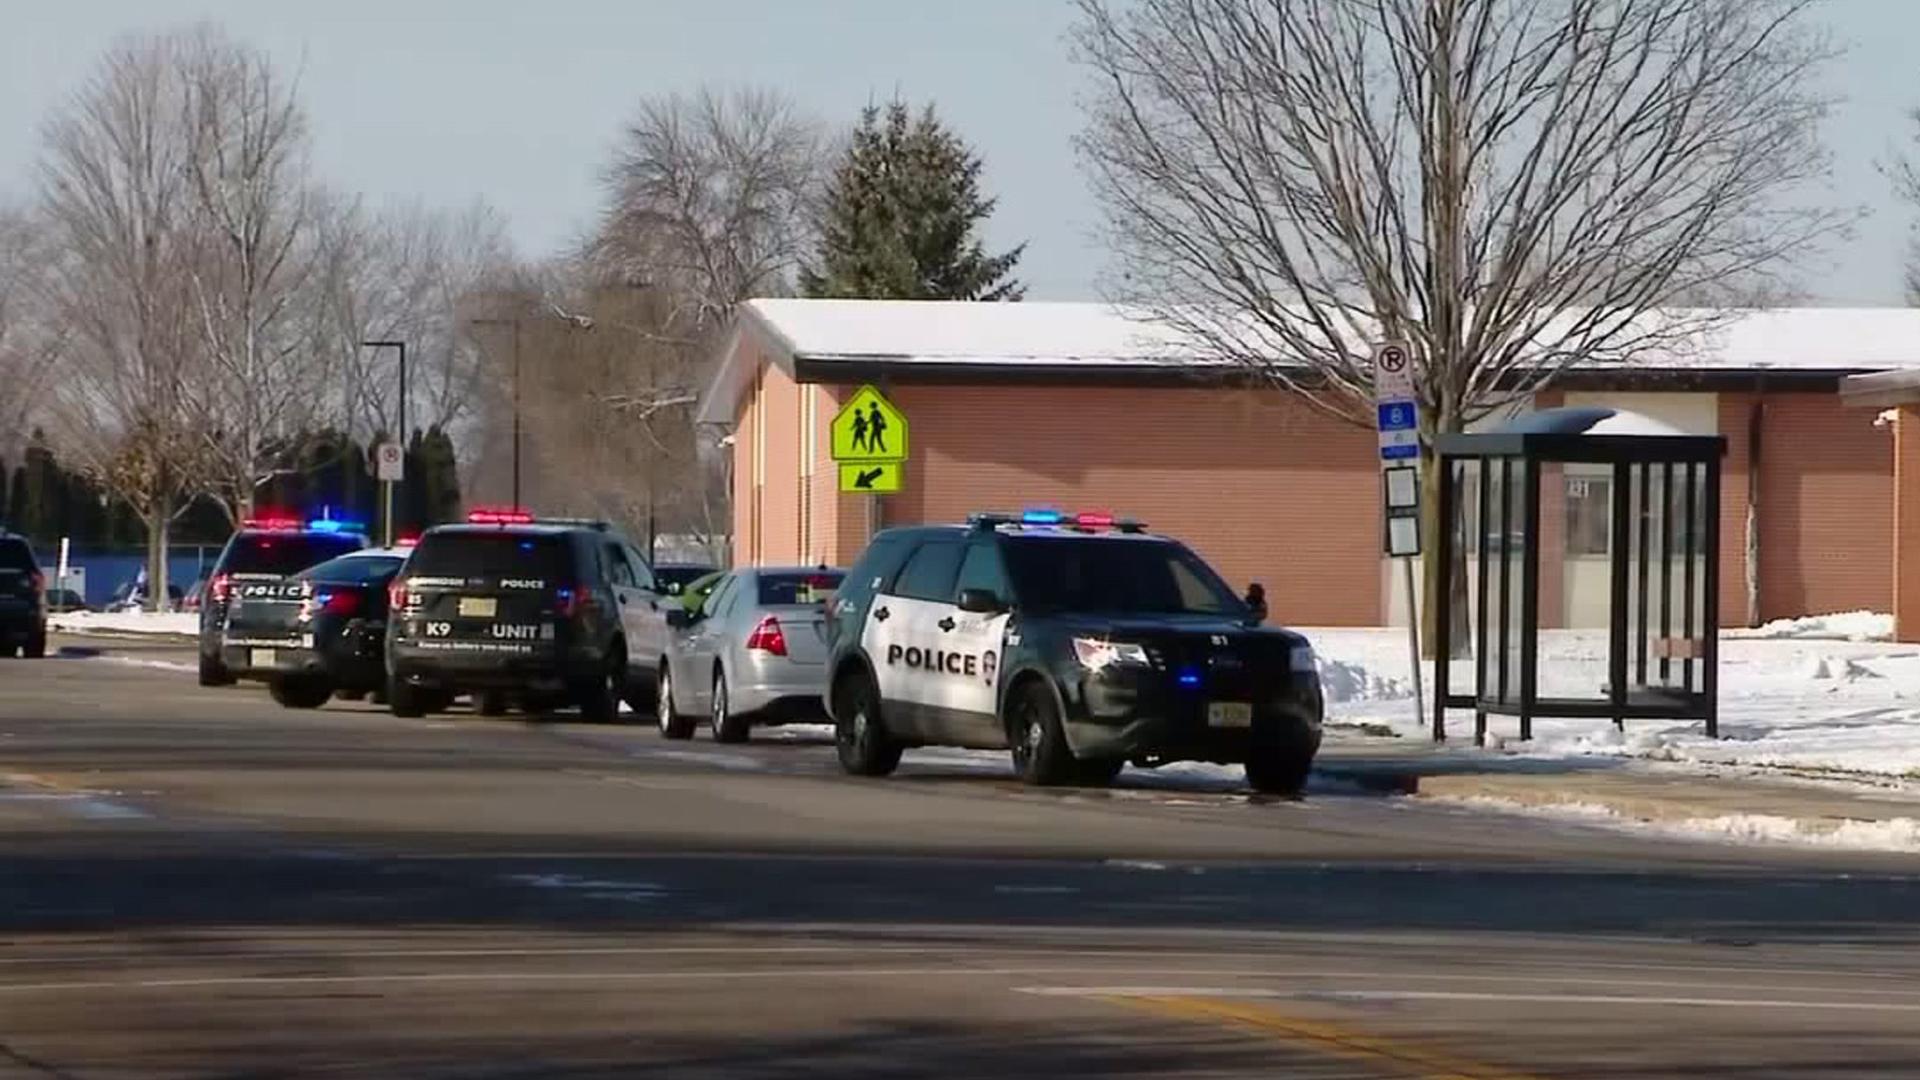 Police vehicles are seen outside Oshkosh West High School in Oshkosh, Wisconsin, on Dec. 3, 2019. (Credit: WITI)